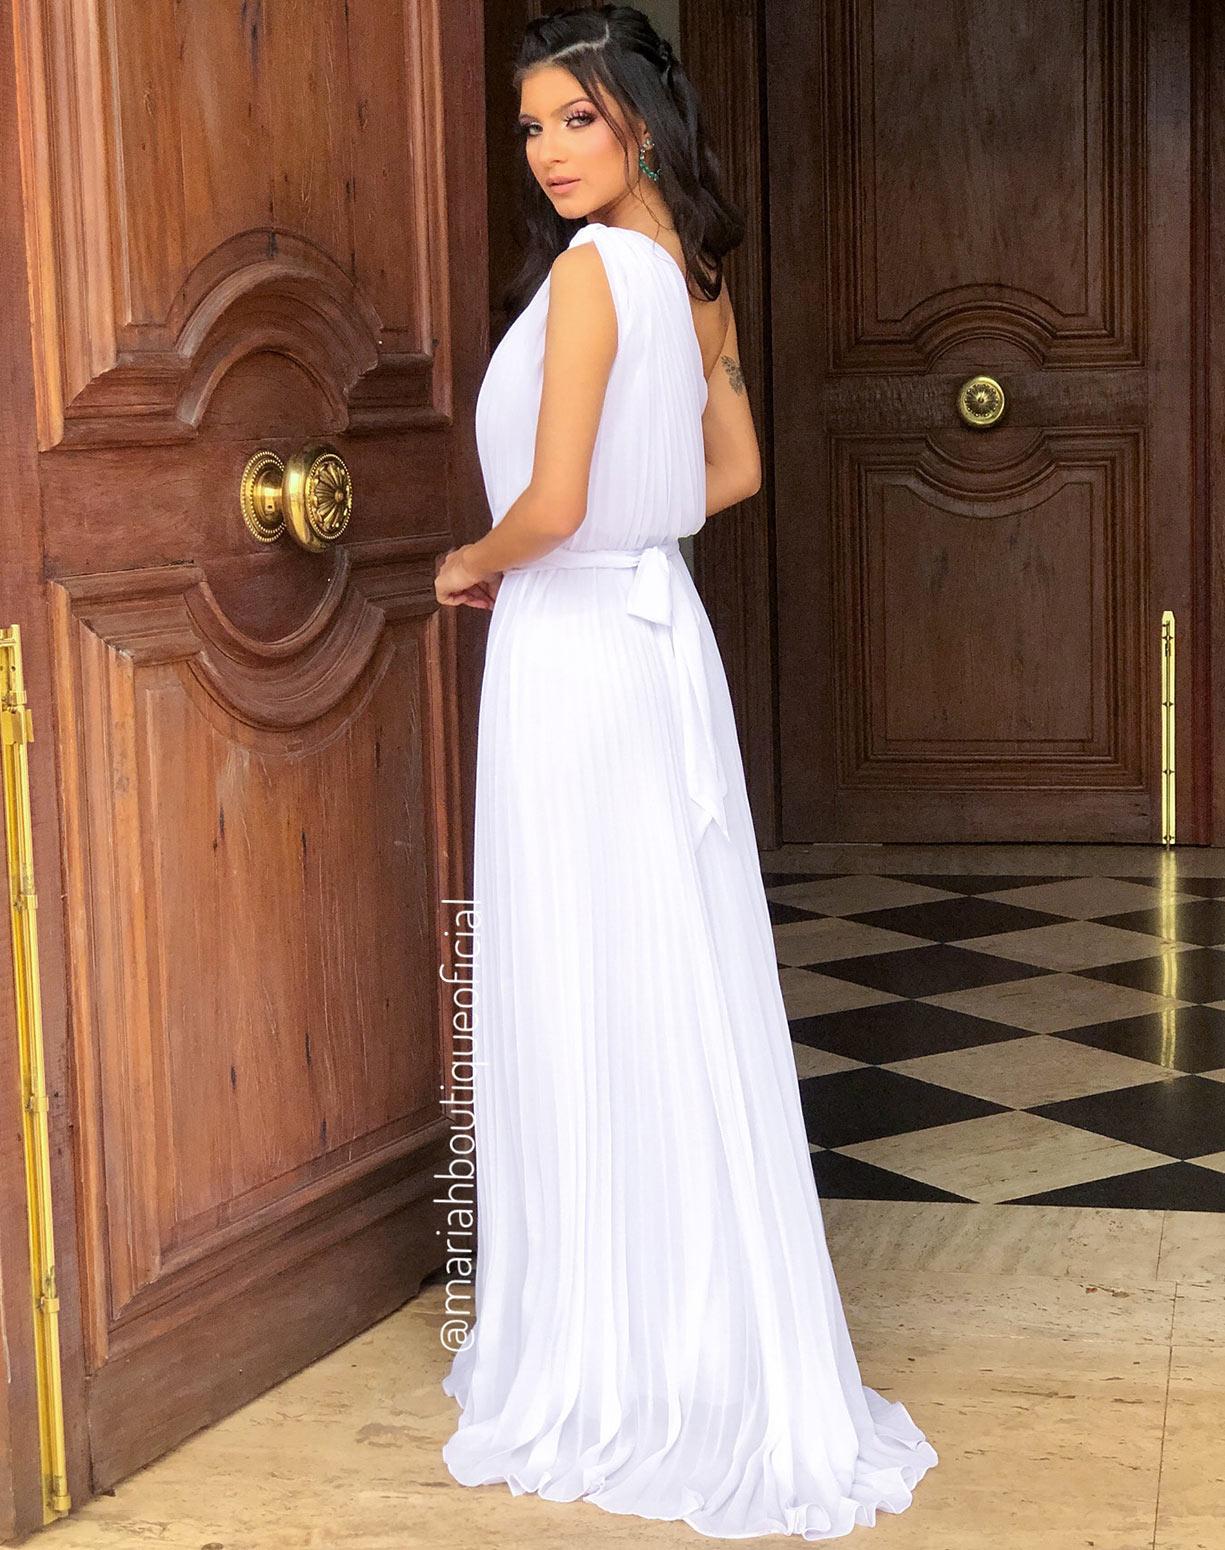 Vestido Branco Plissado de um Ombro Só